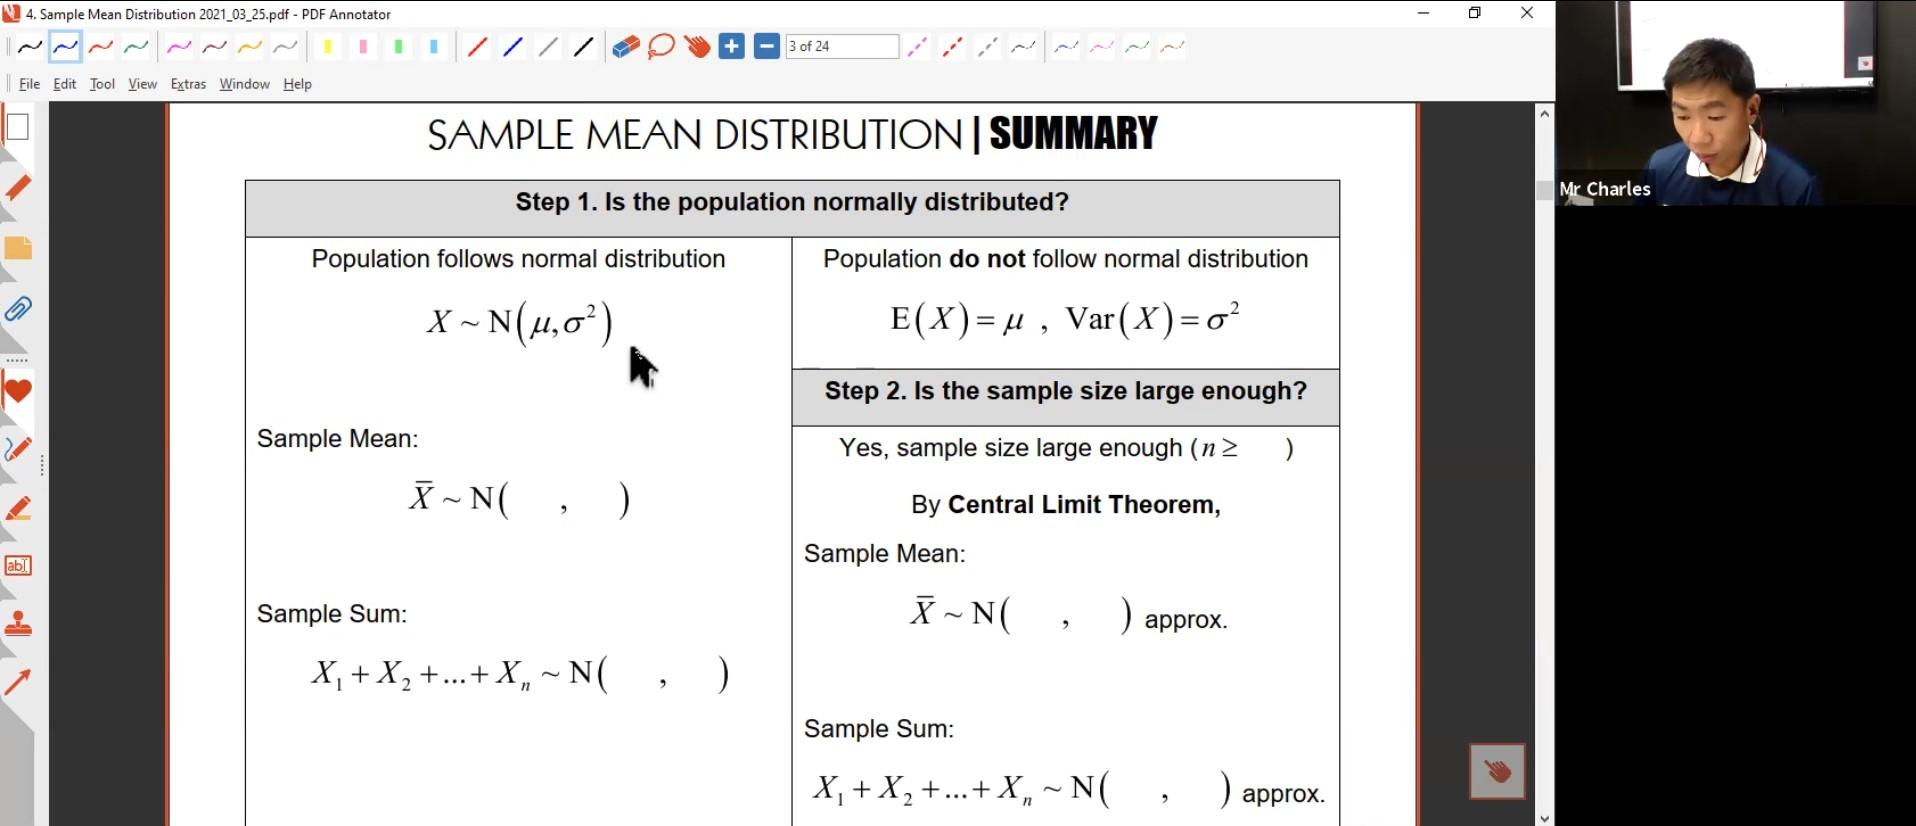 23. Sample Mean Distribution 2